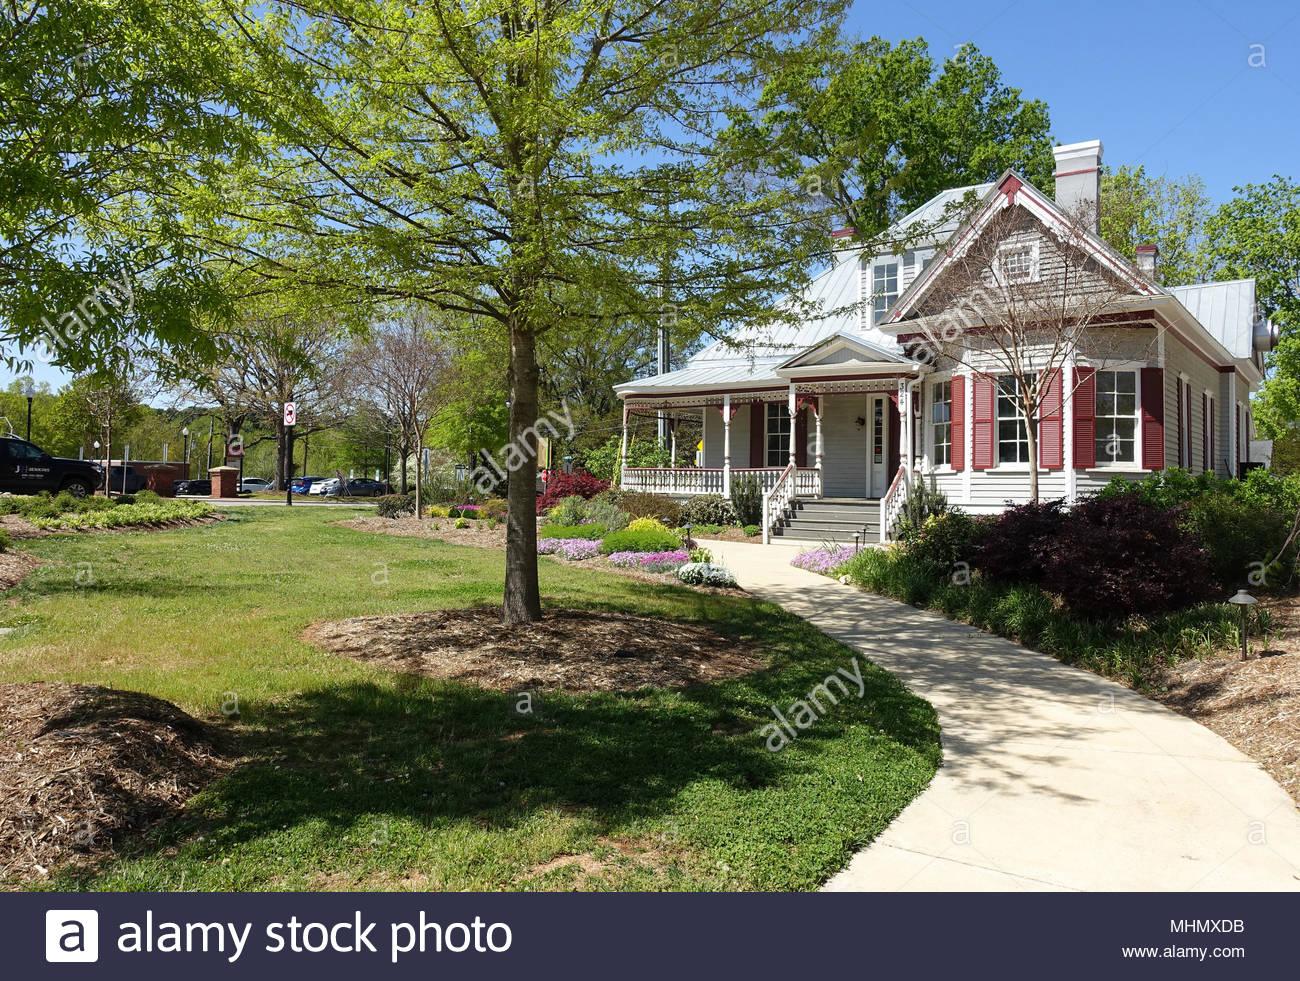 Neighborhood in downtown Cary, North Carolina Stock Photo